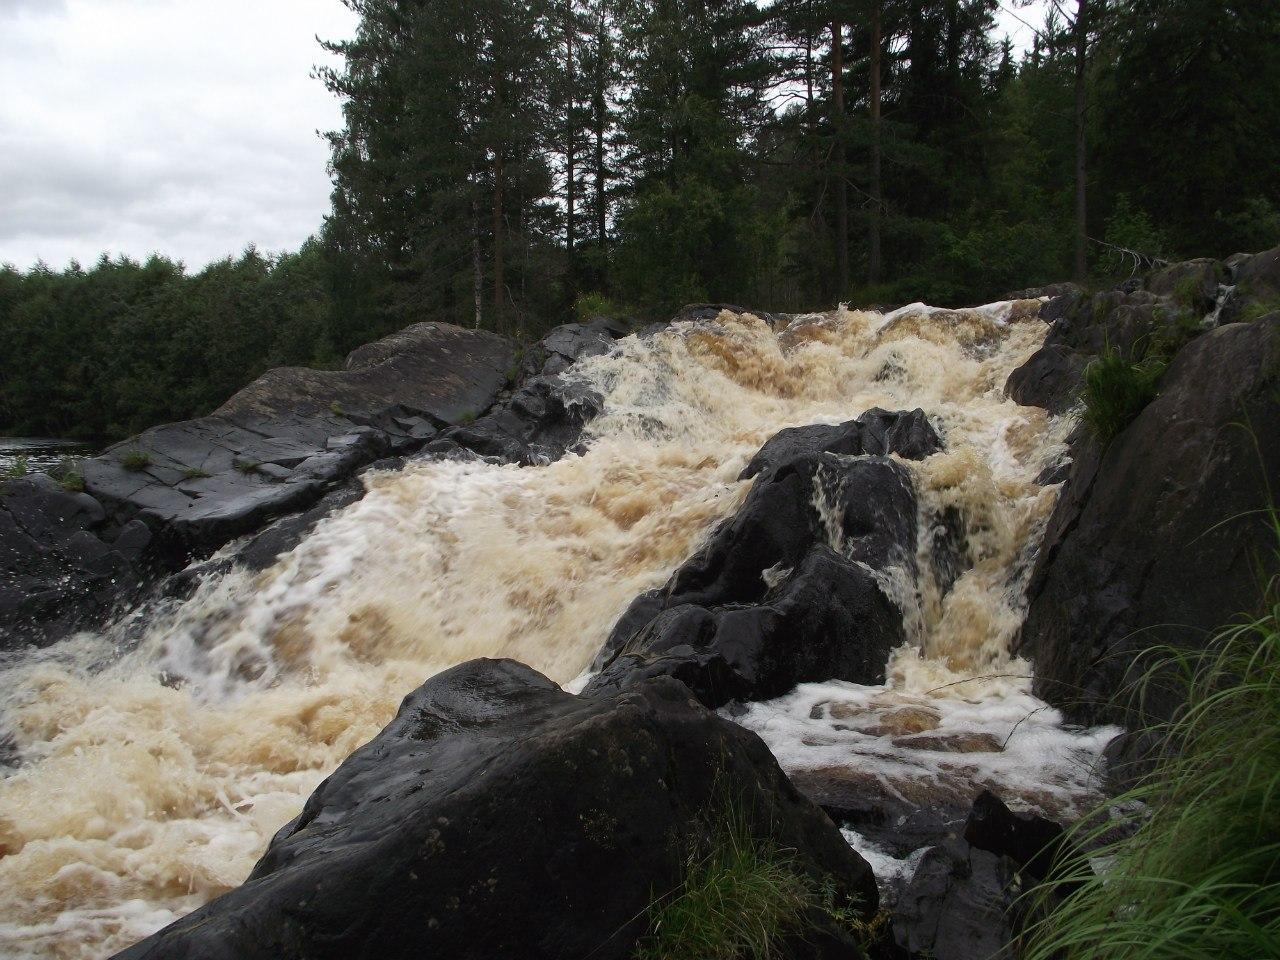 Рускеальские водопады, Ахвенкоски, источник фото: http://prigorod-peterburg.ru/kareliya/ruskealskie-vodopady/